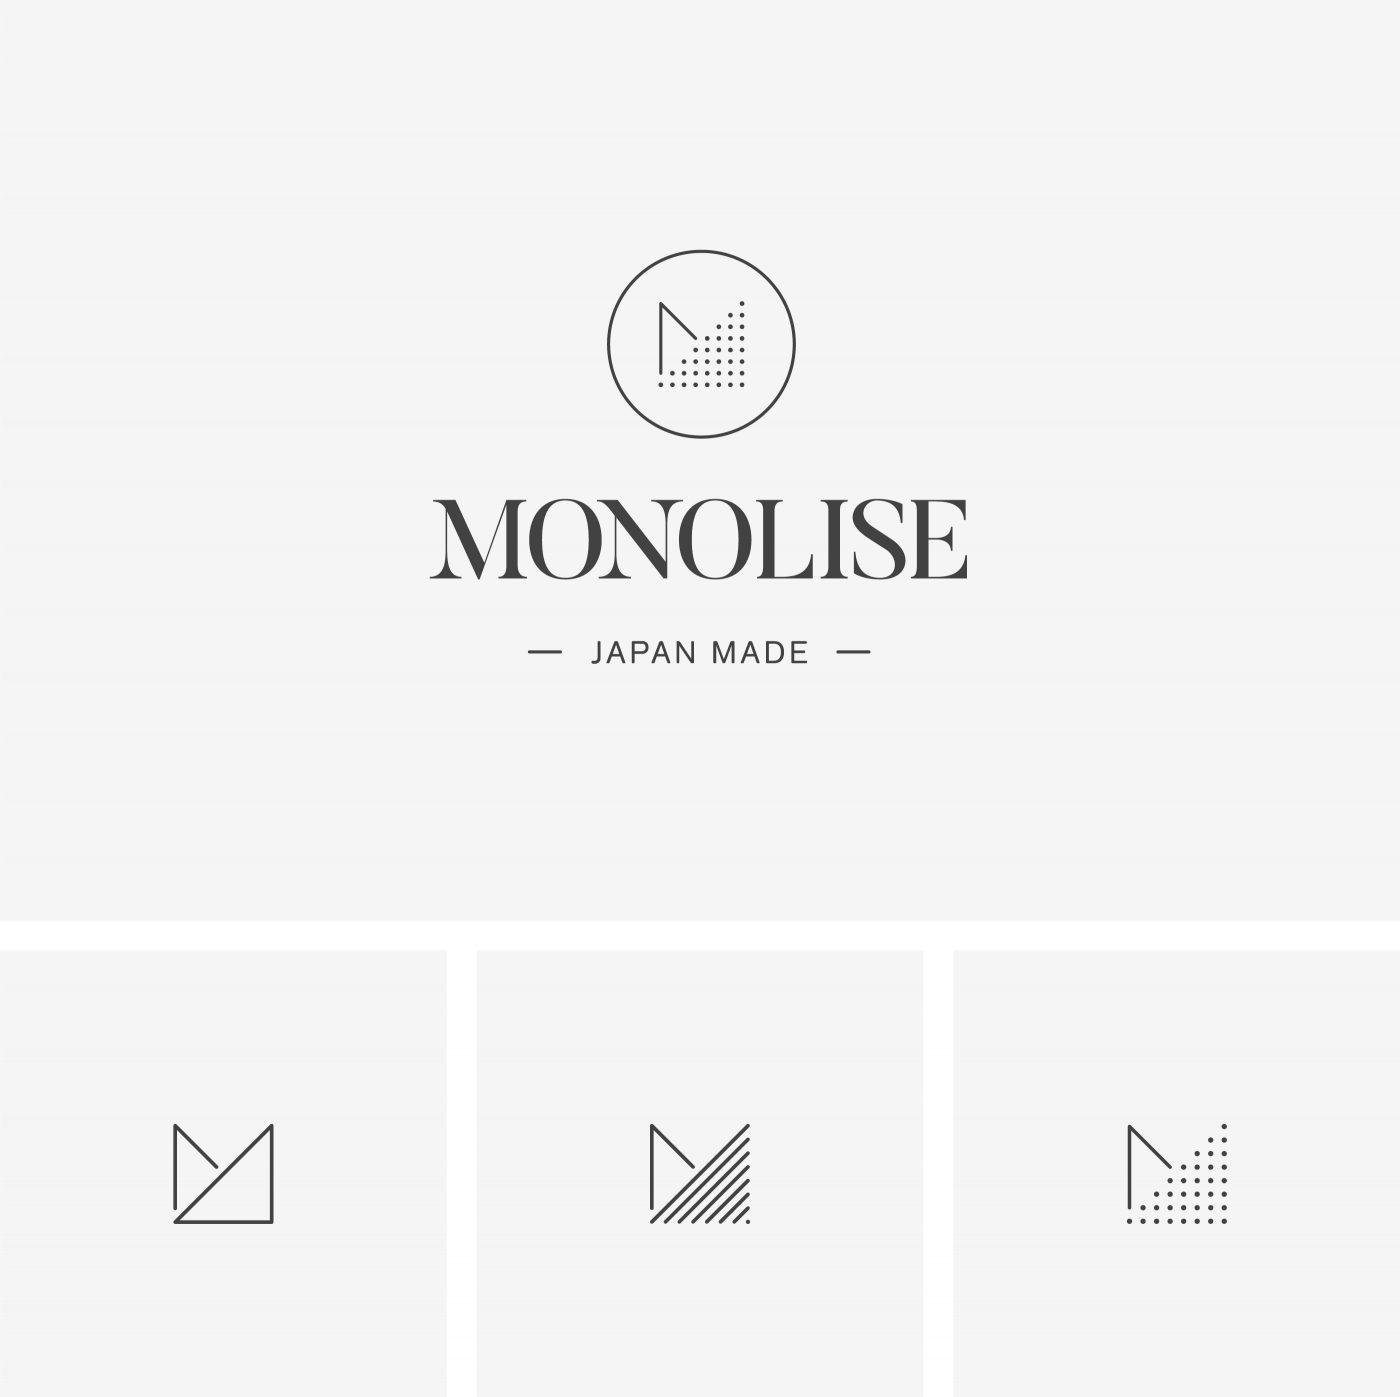 Monolise